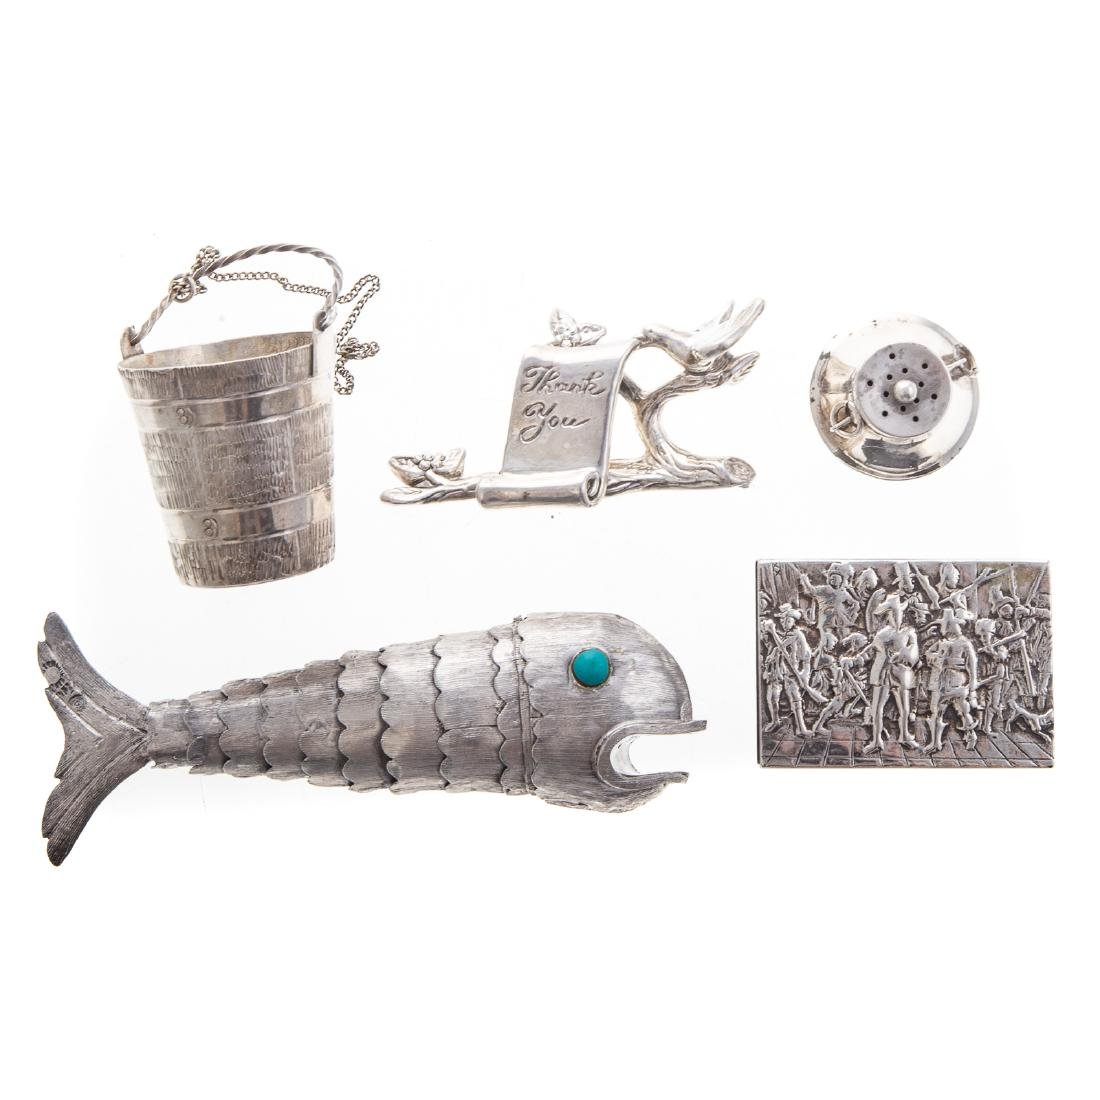 American & Continental silver objets de vertu